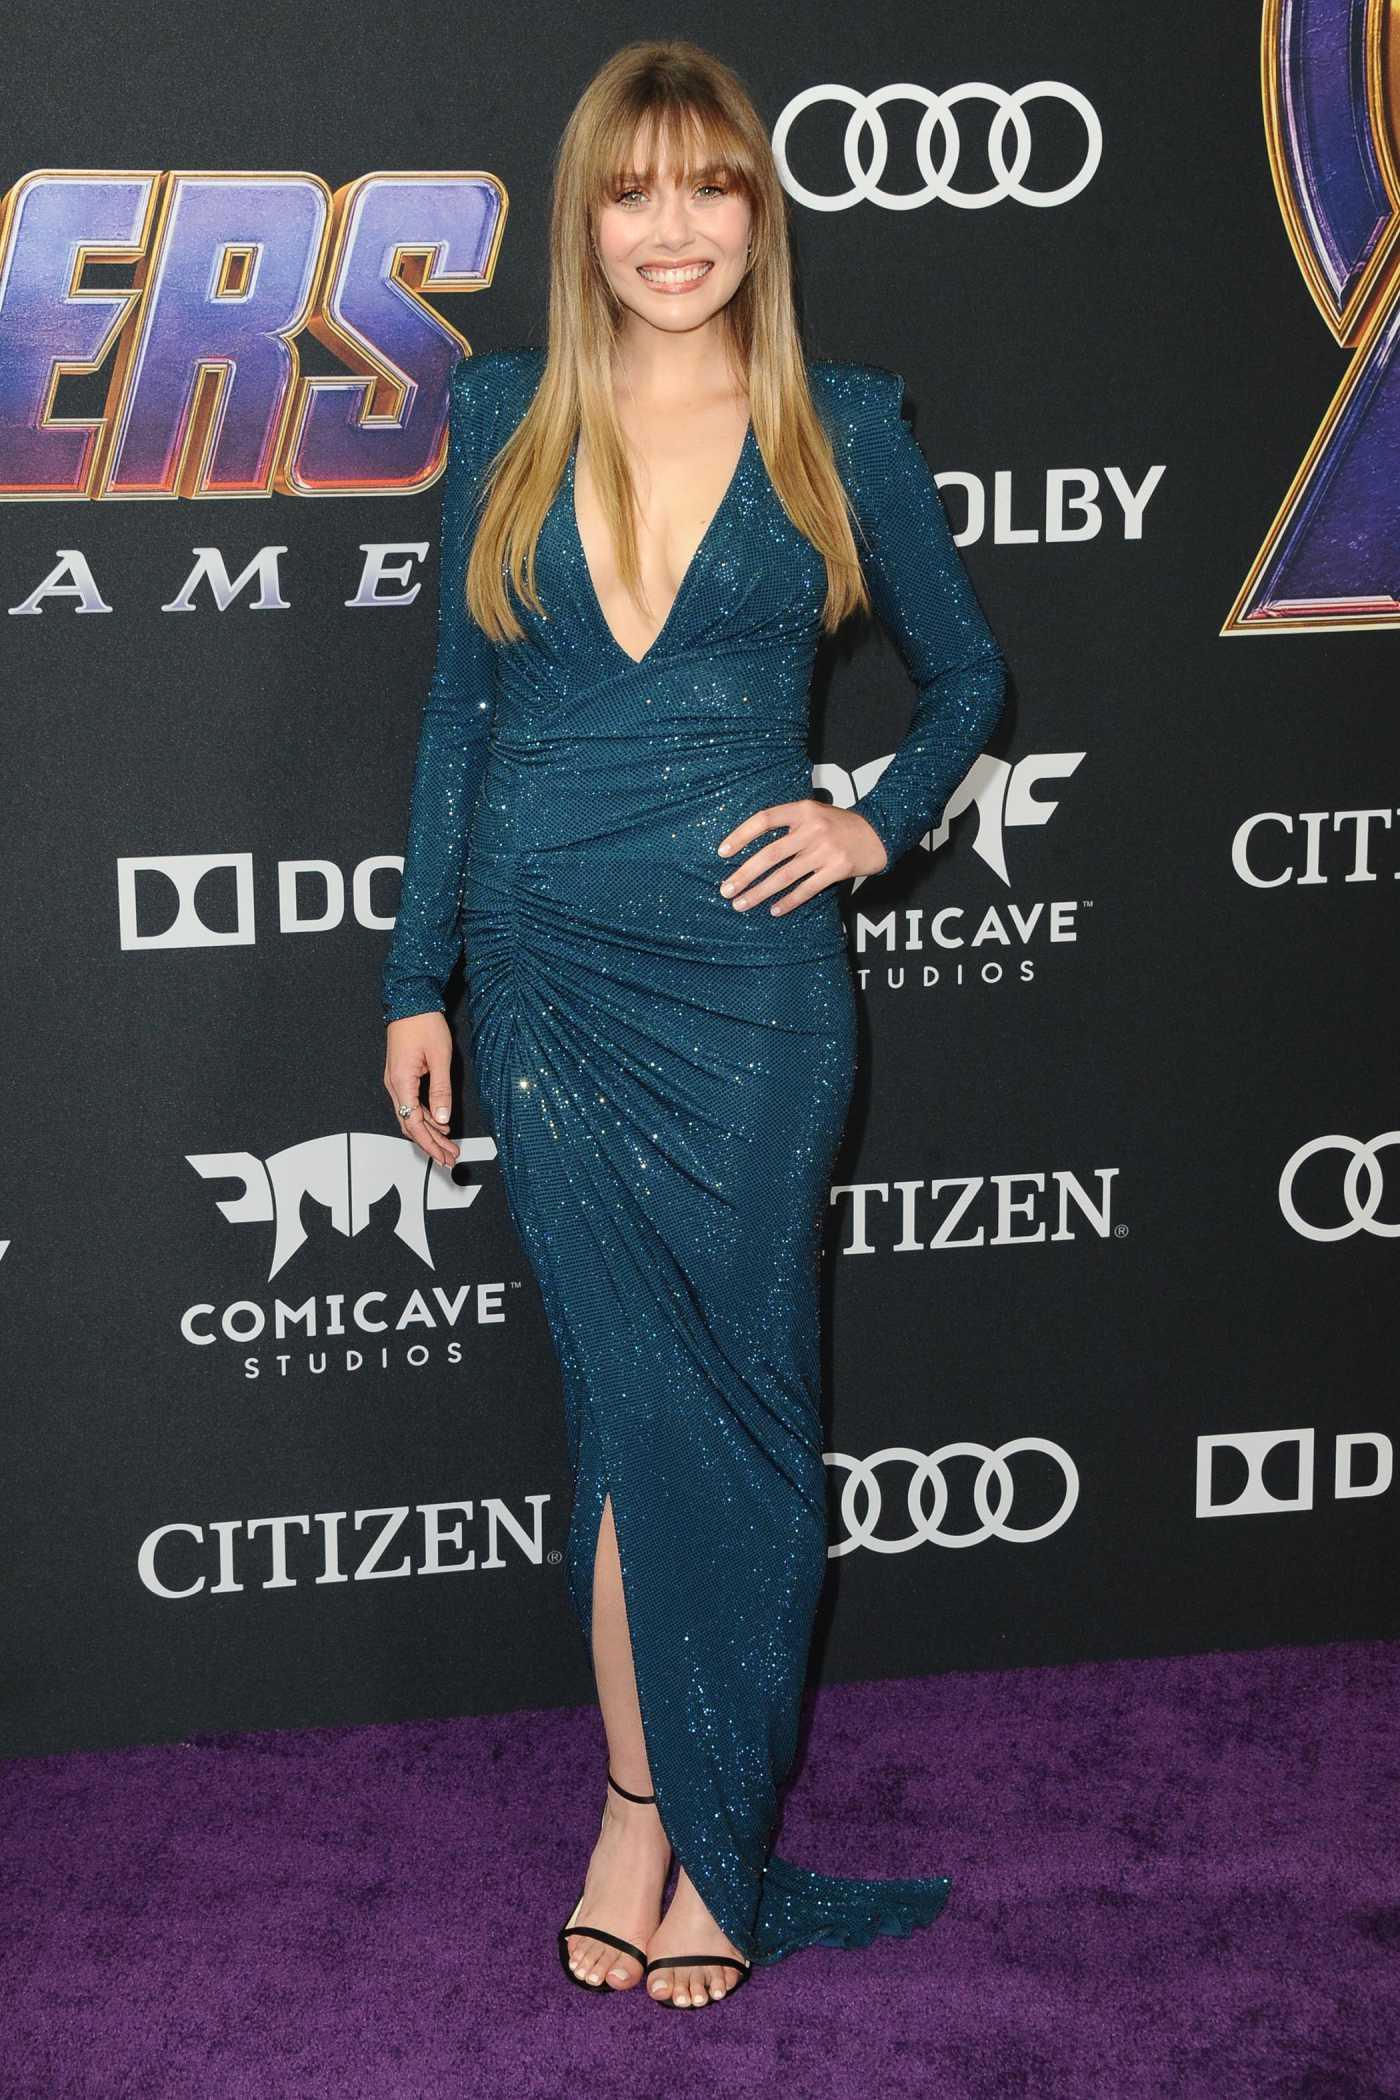 Elizabeth Olsen Attends Avengers: Endgame Premiere in Los Angeles 04/22/2019